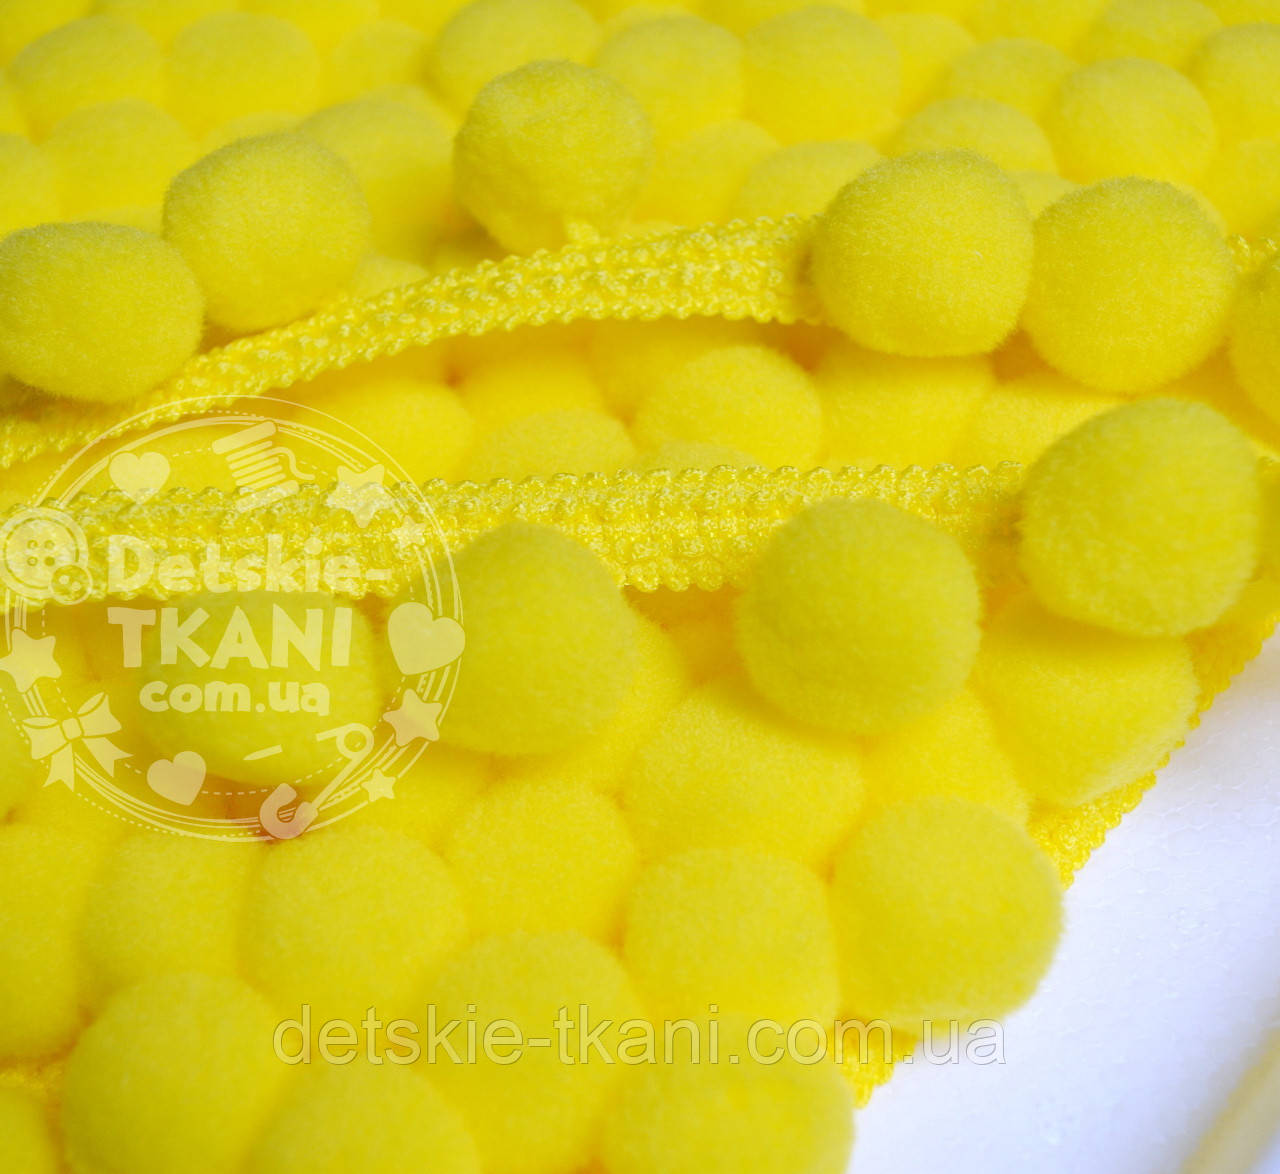 Тасьма з помпонами 20 мм жовтого кольору (Польща)